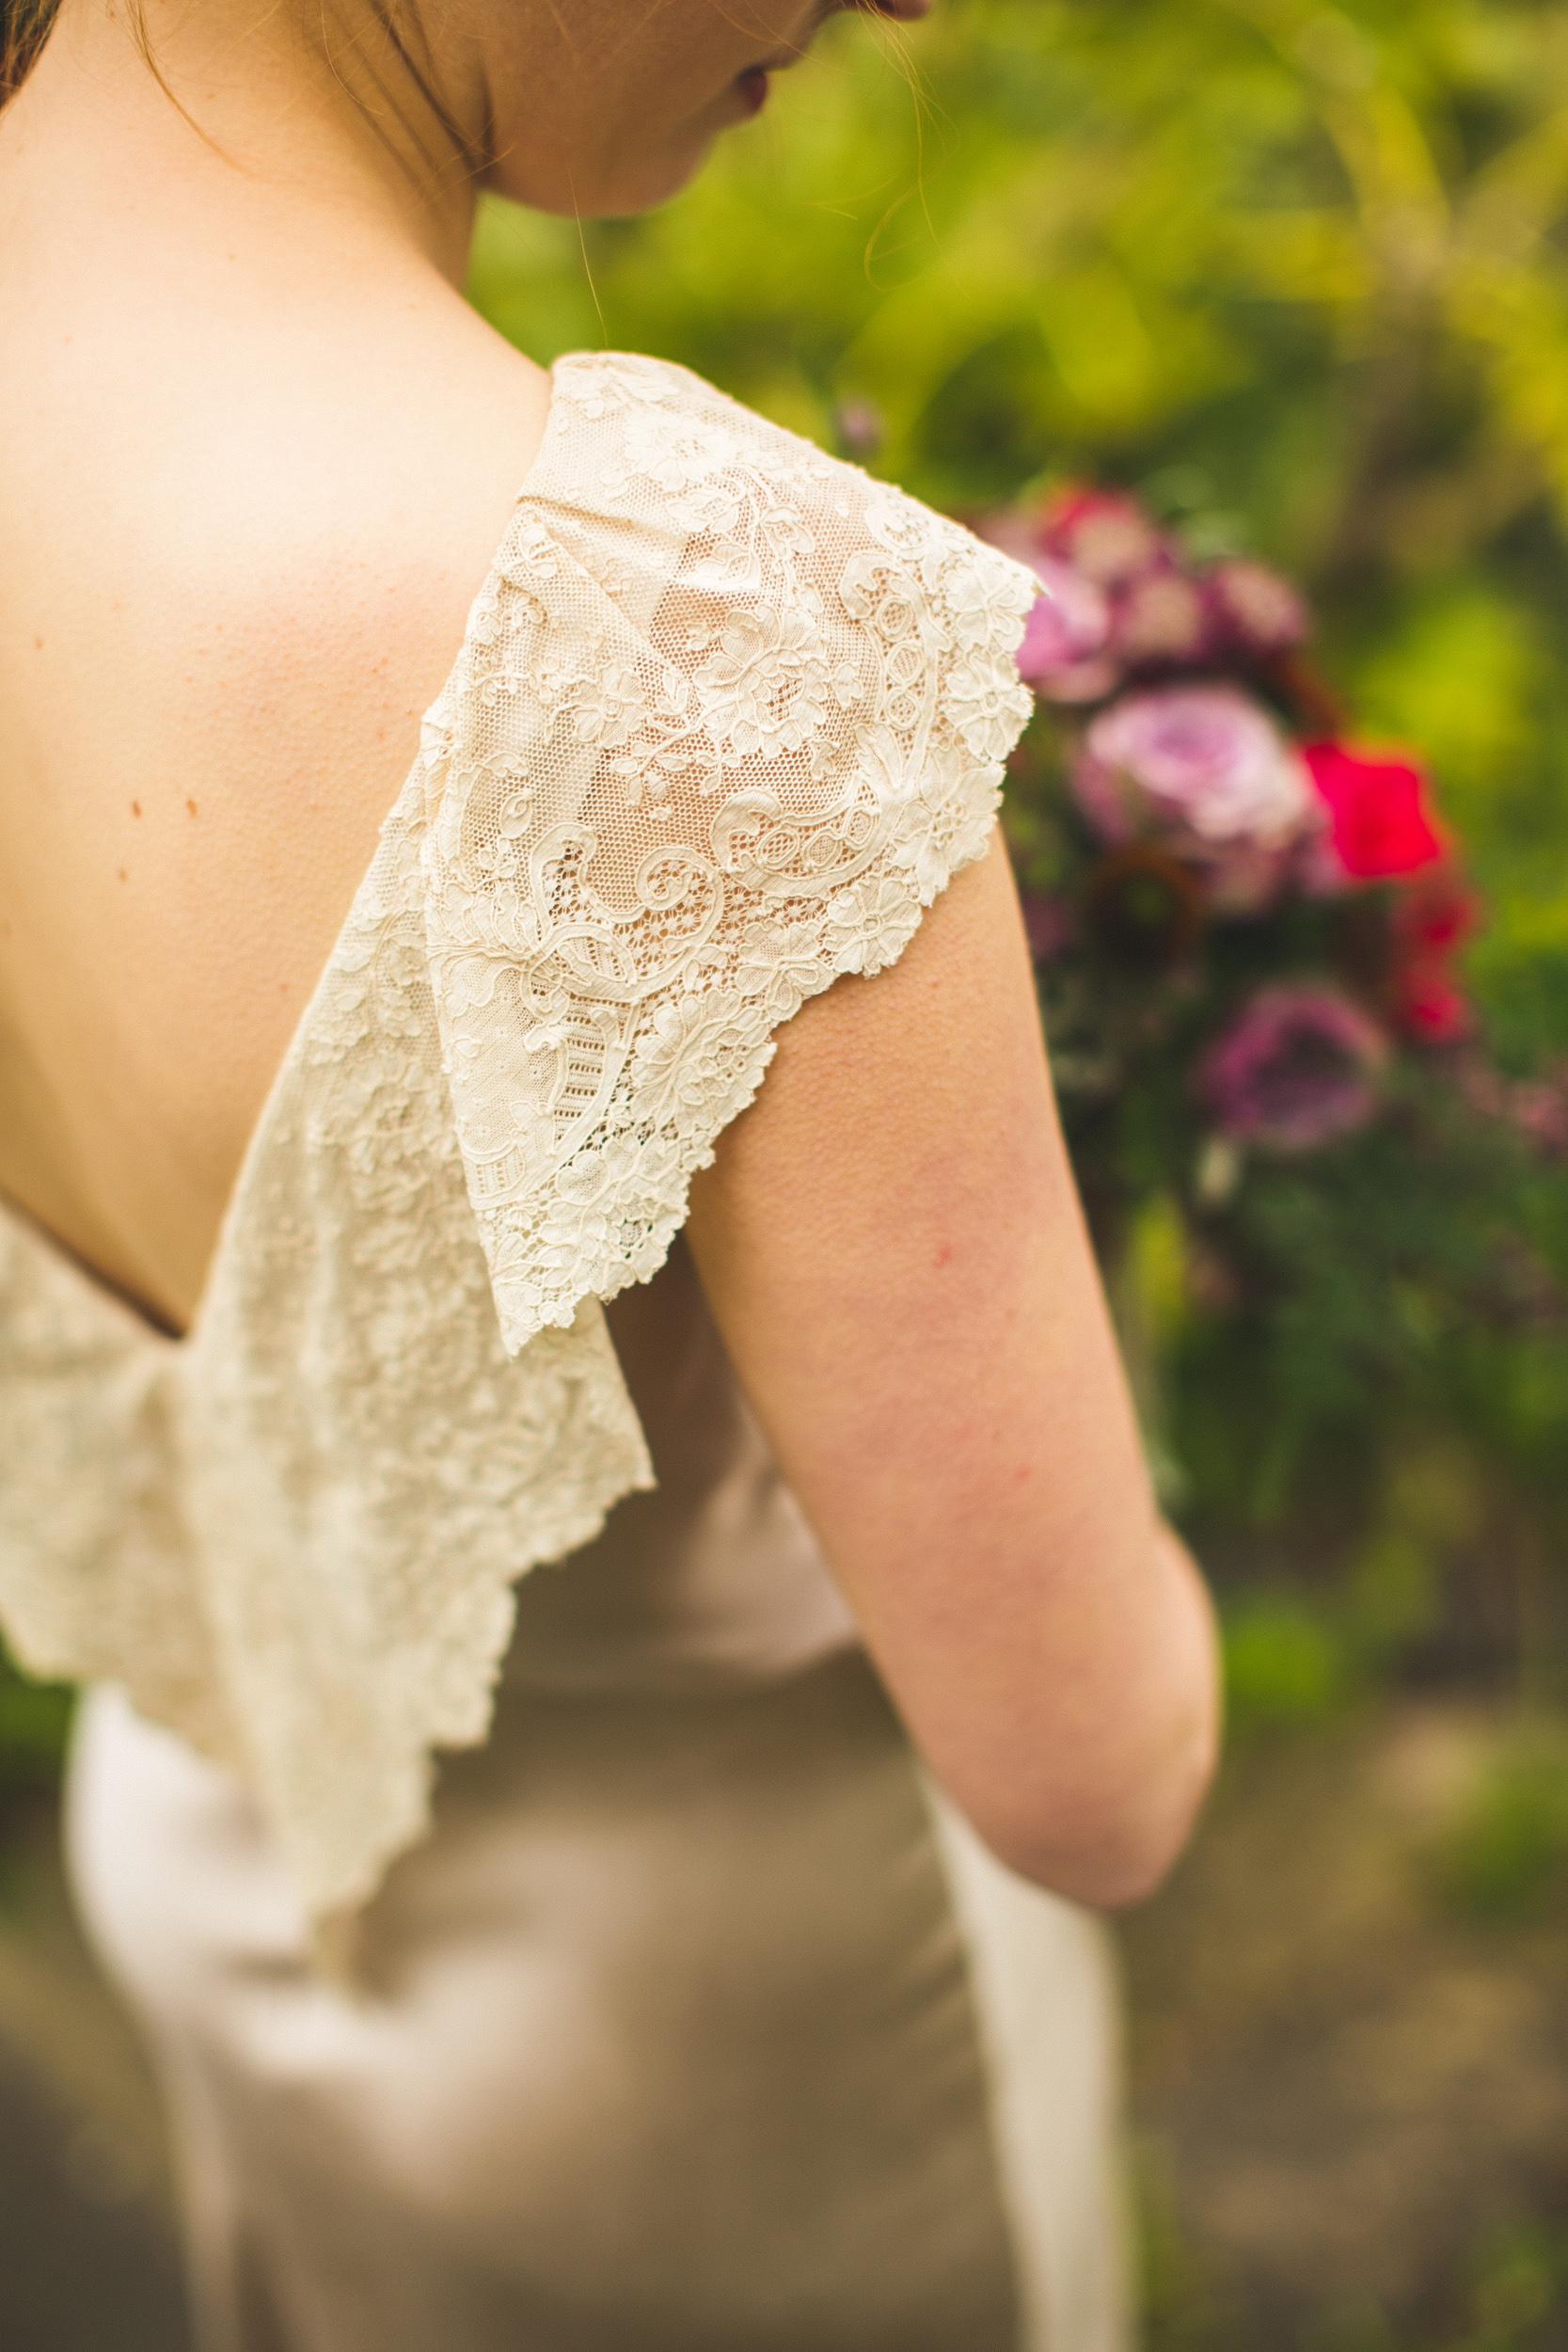 kate-beaumont-vintage-inspired-bridal-wedding-dresses-Sheffield-S6-25.jpg